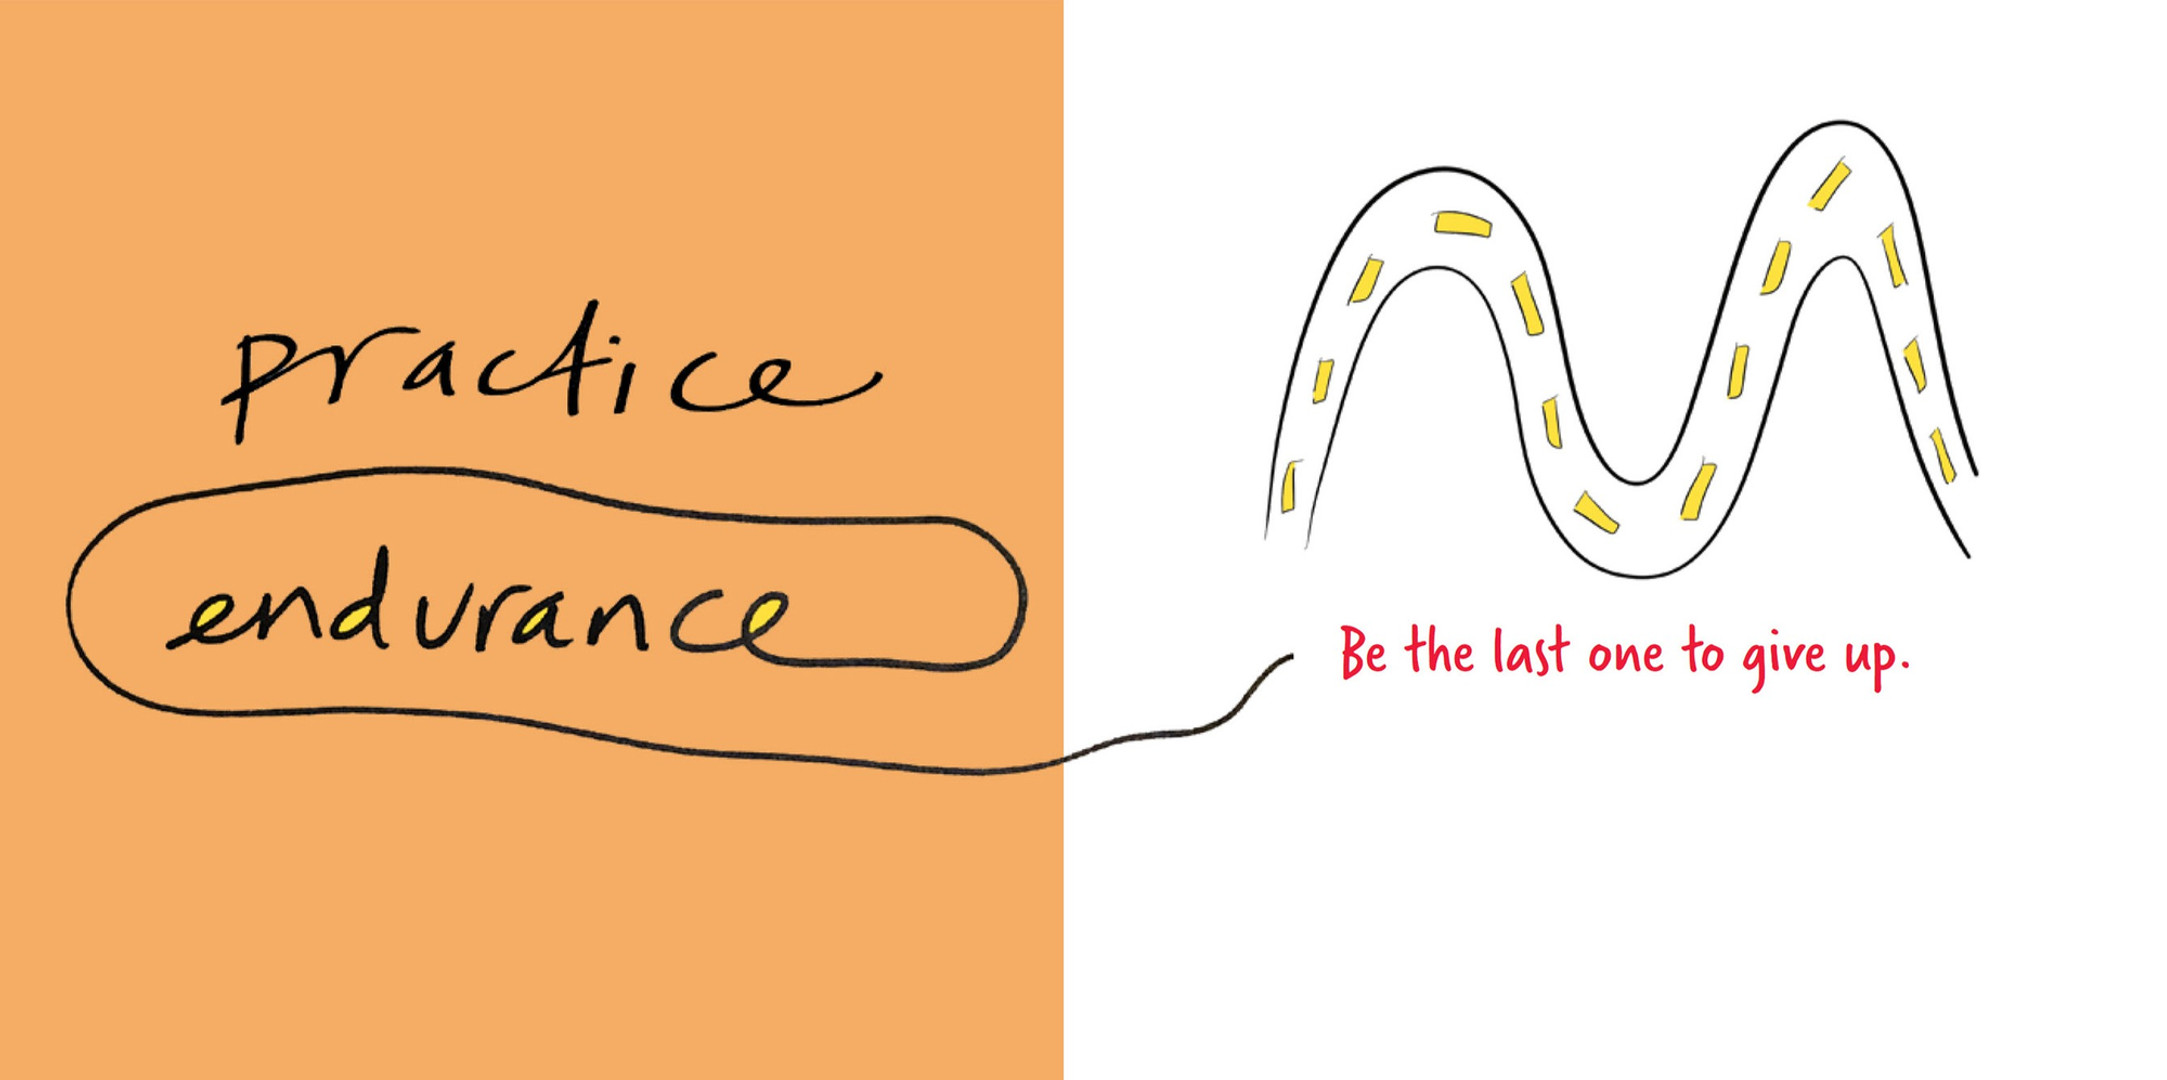 Practice endurance